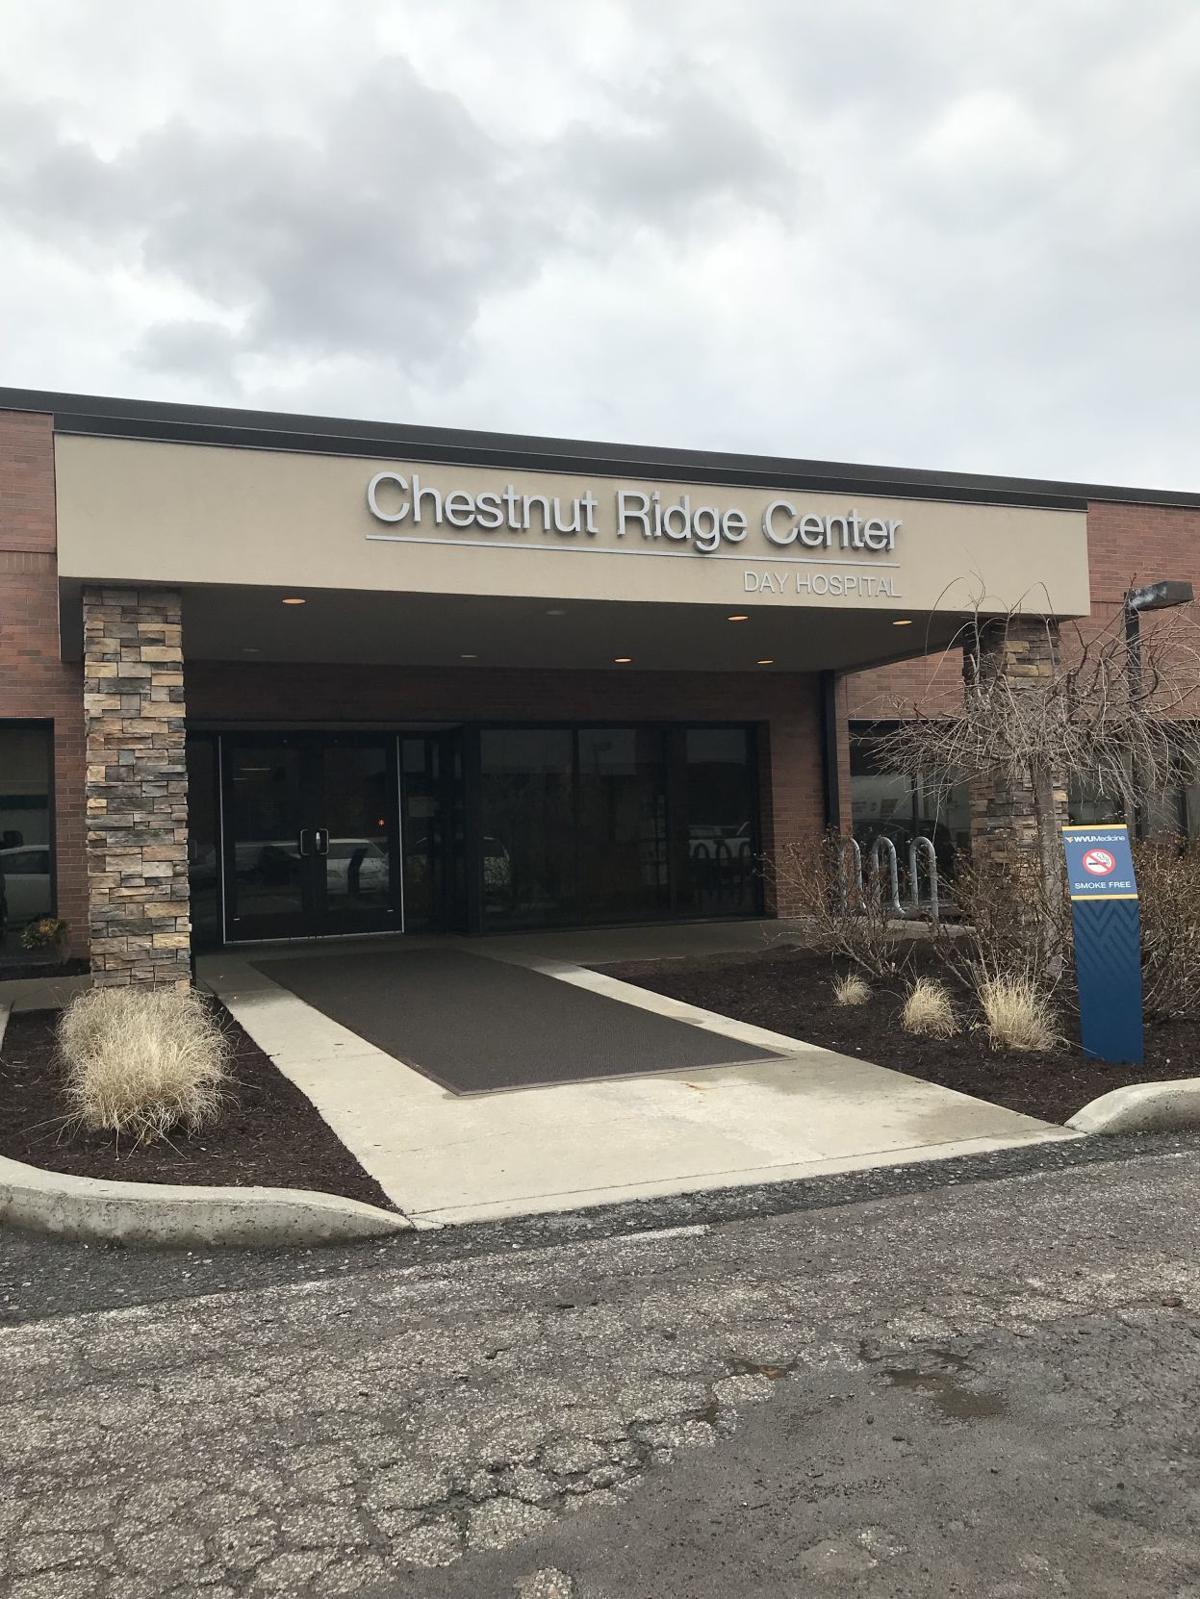 Chestnut Ridge Center